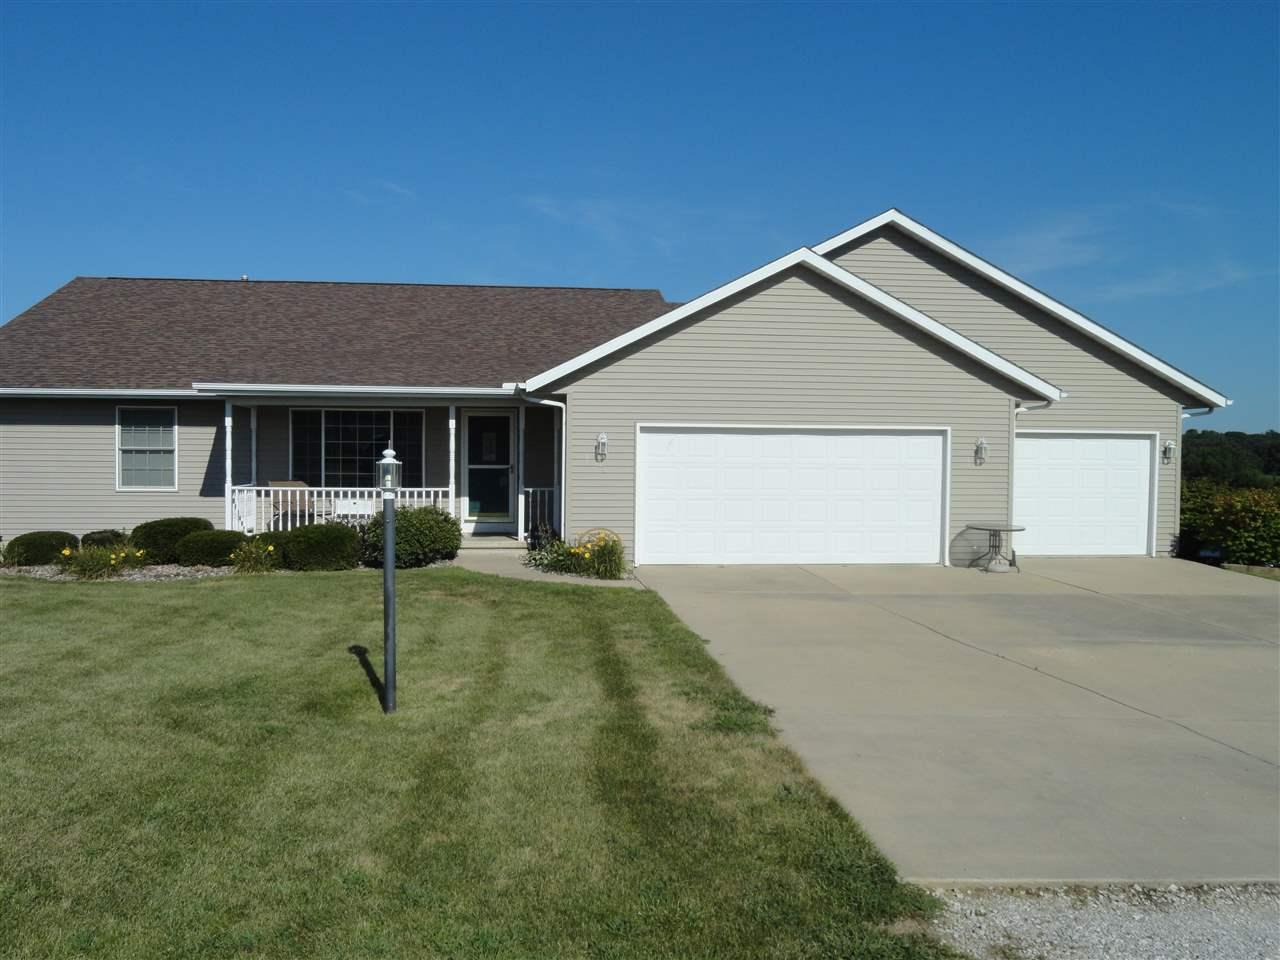 Real Estate for Sale, ListingId: 34855319, Orion,IL61273